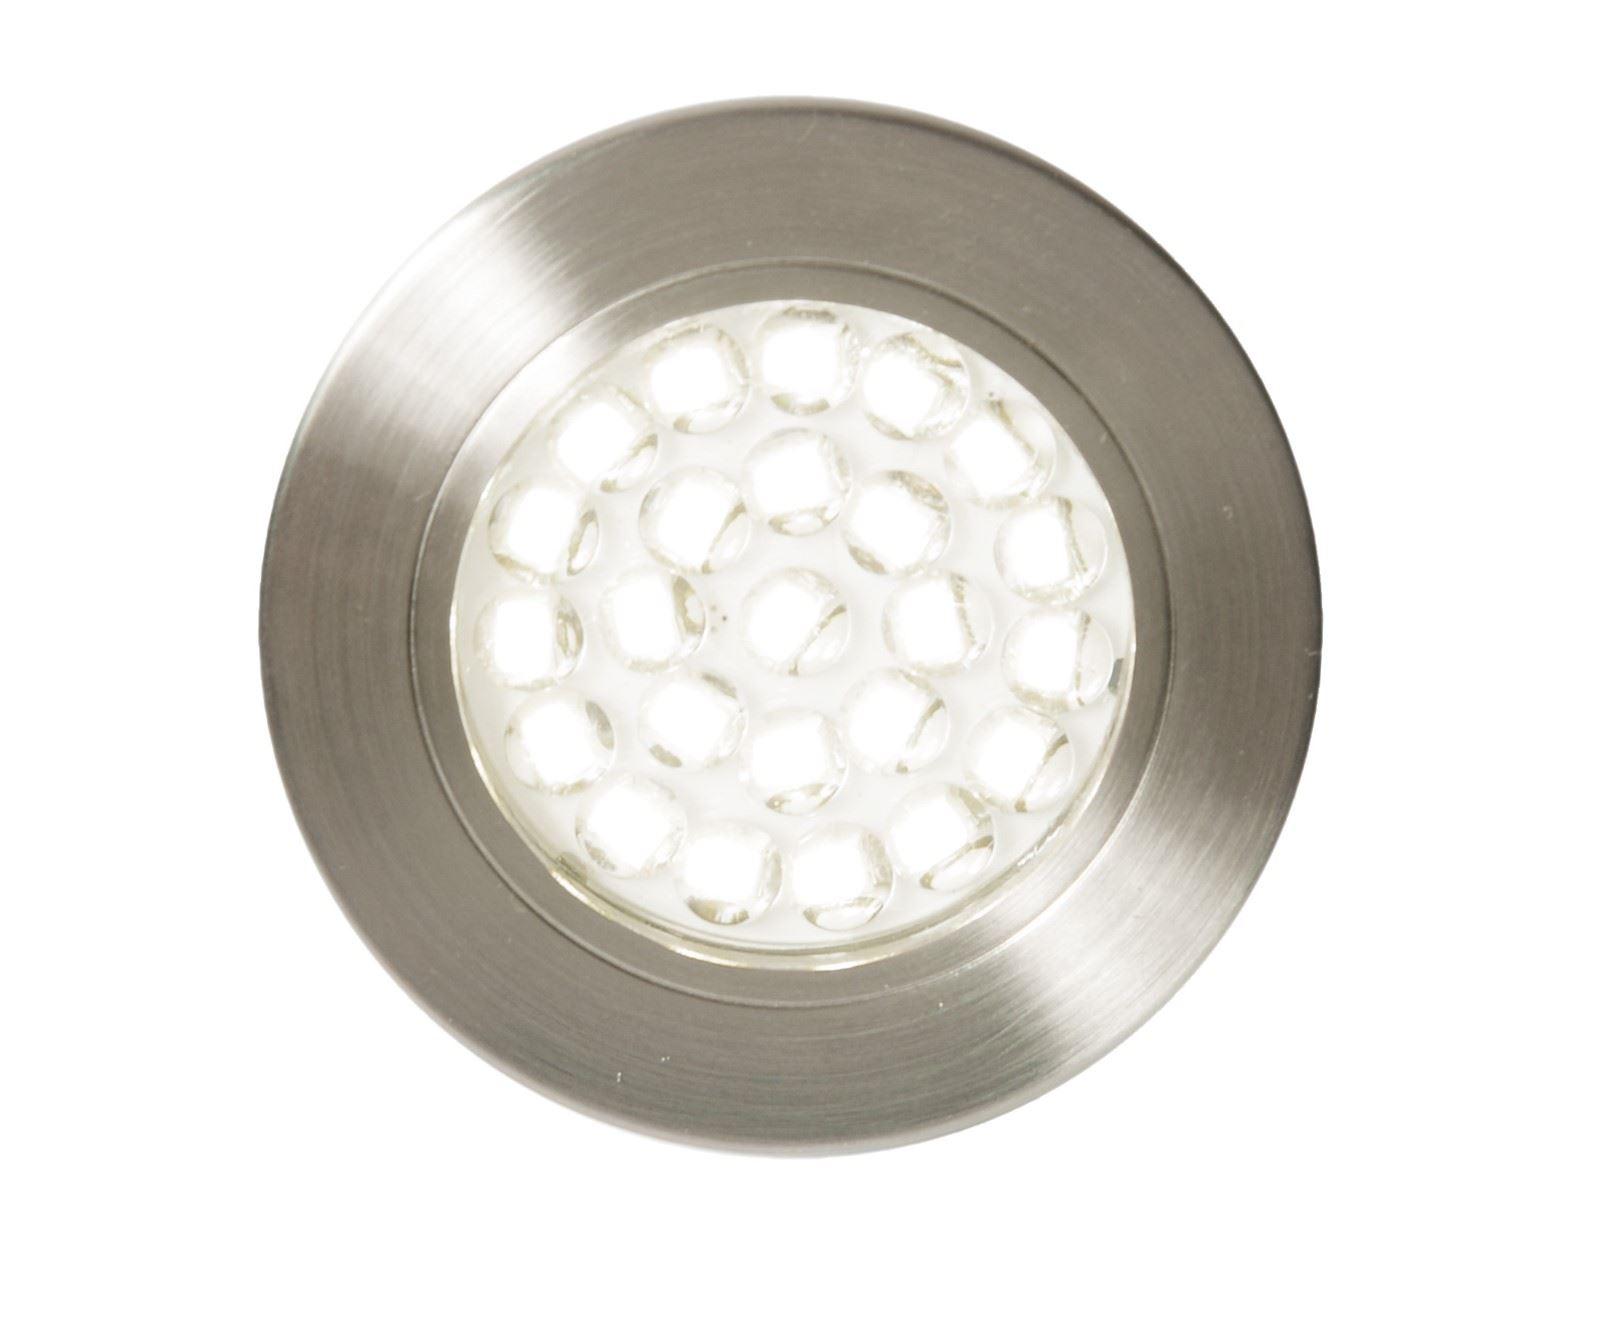 Pozza Led, Mains Voltage, Circular Cabinet Light, 3000K Warm White